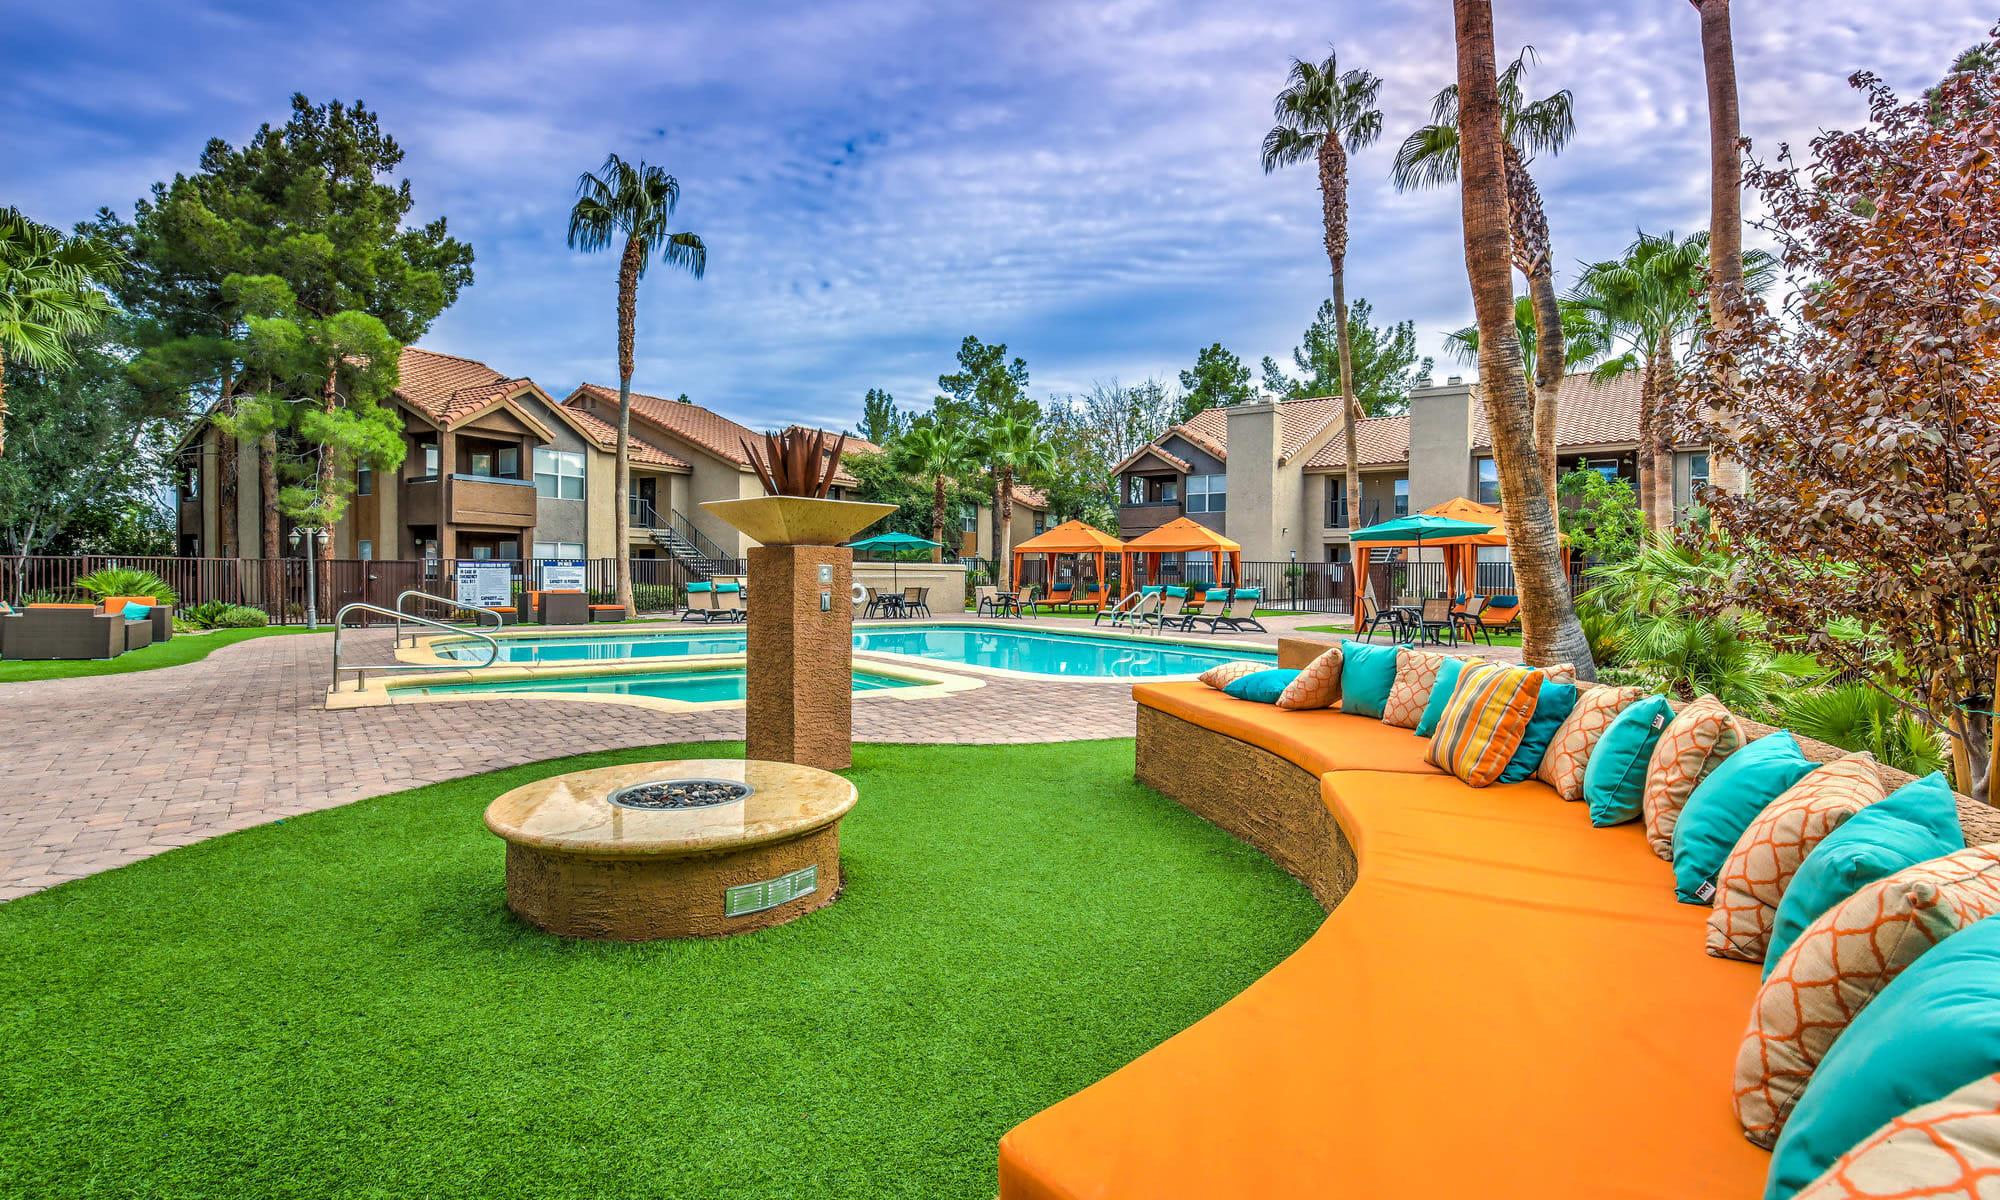 Apartments at Solis at Flamingo in Las Vegas, Nevada